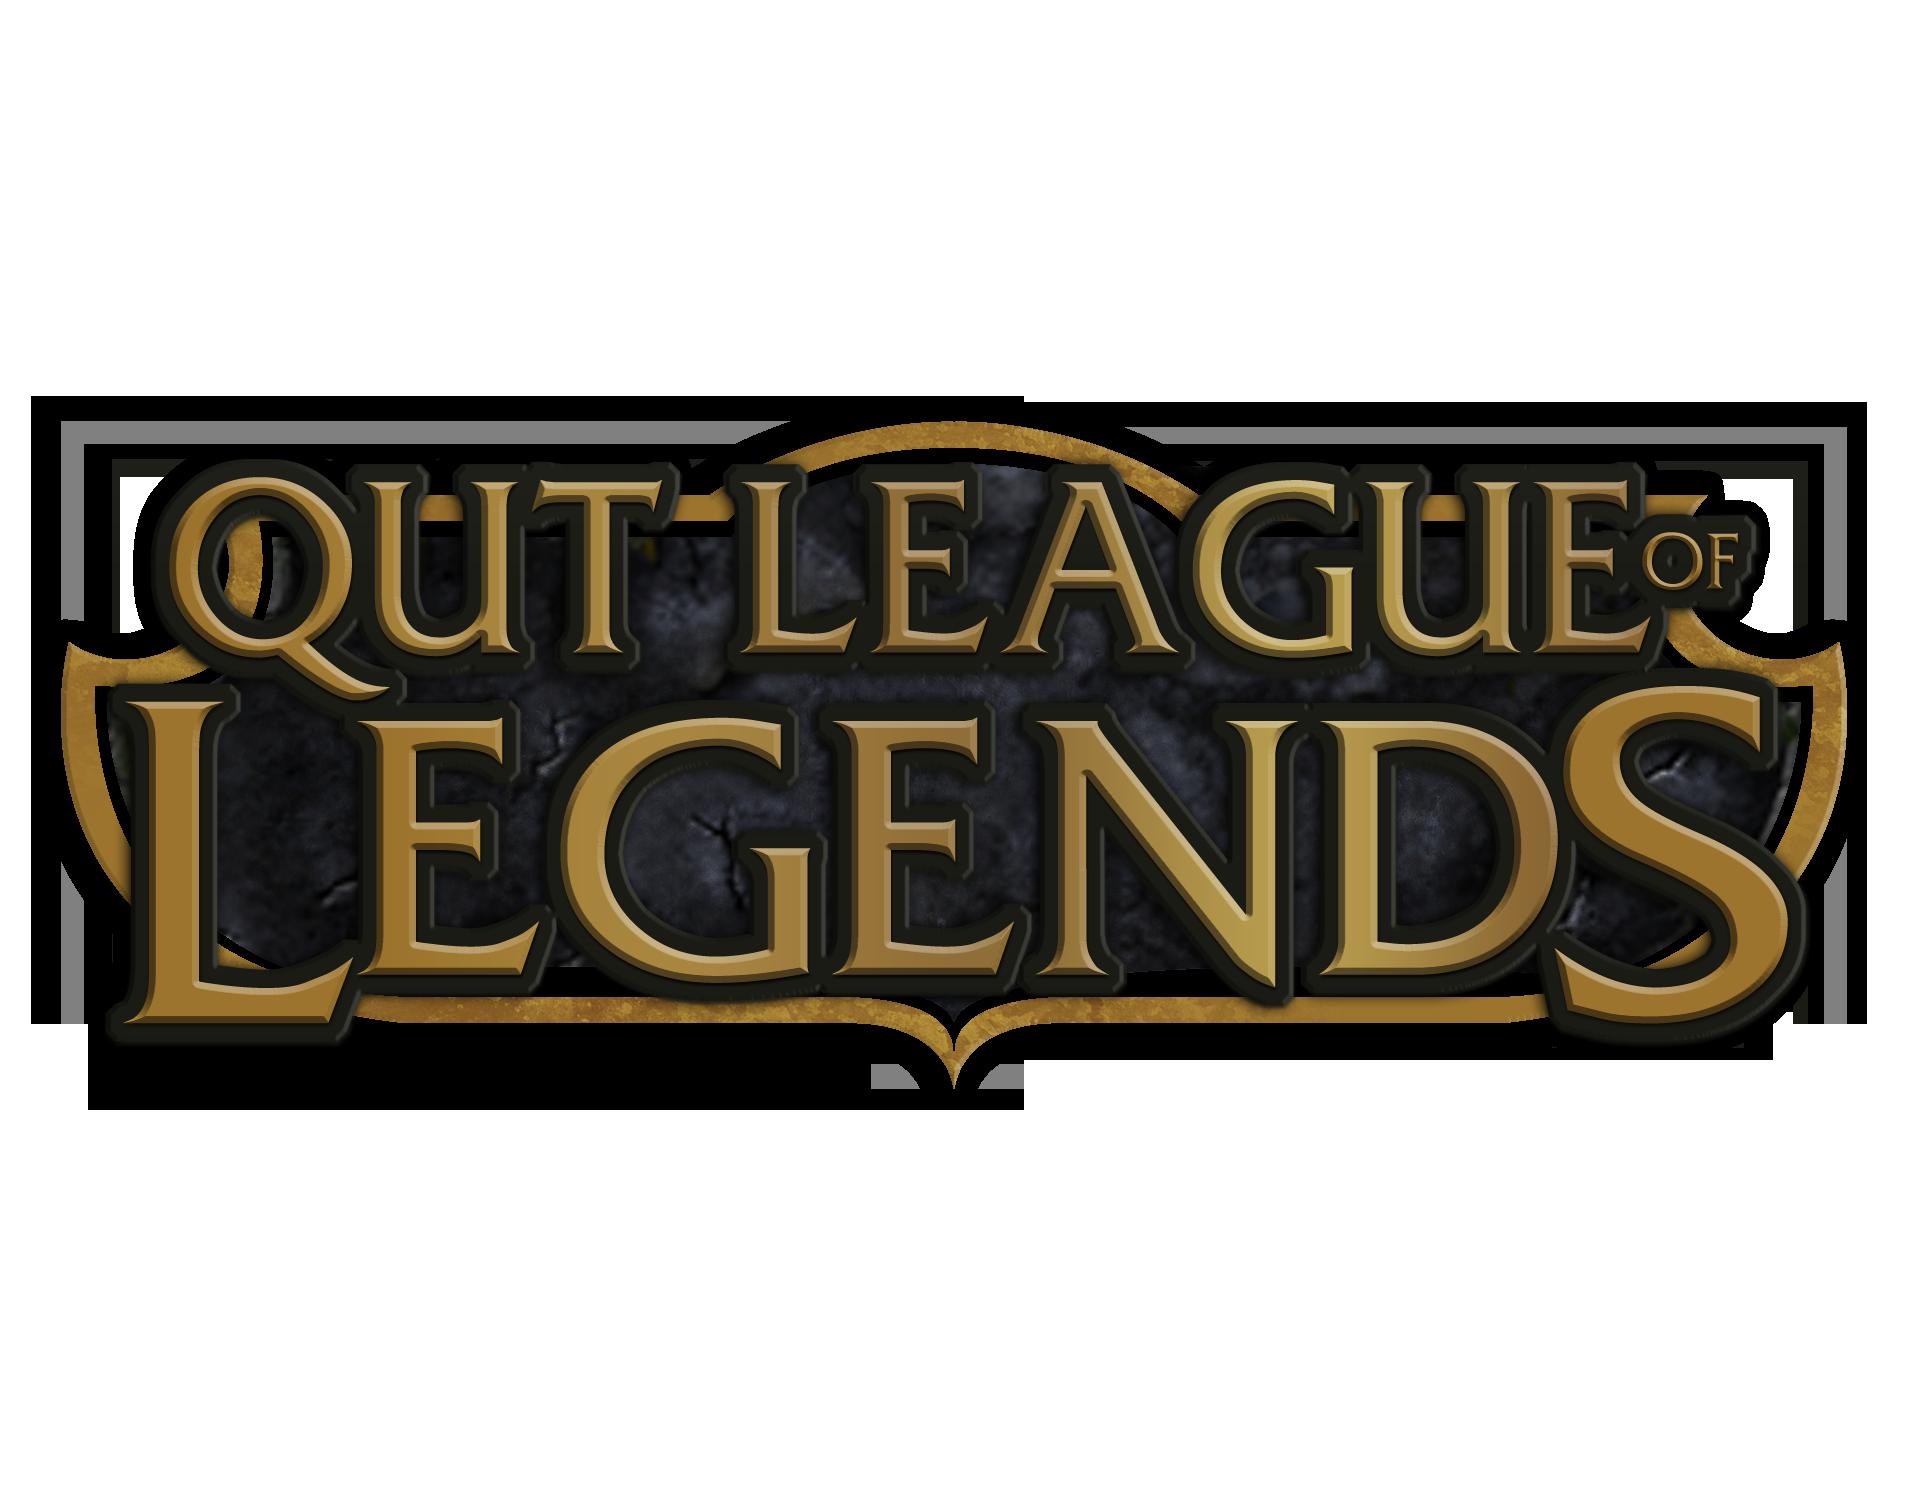 League of legends Logos